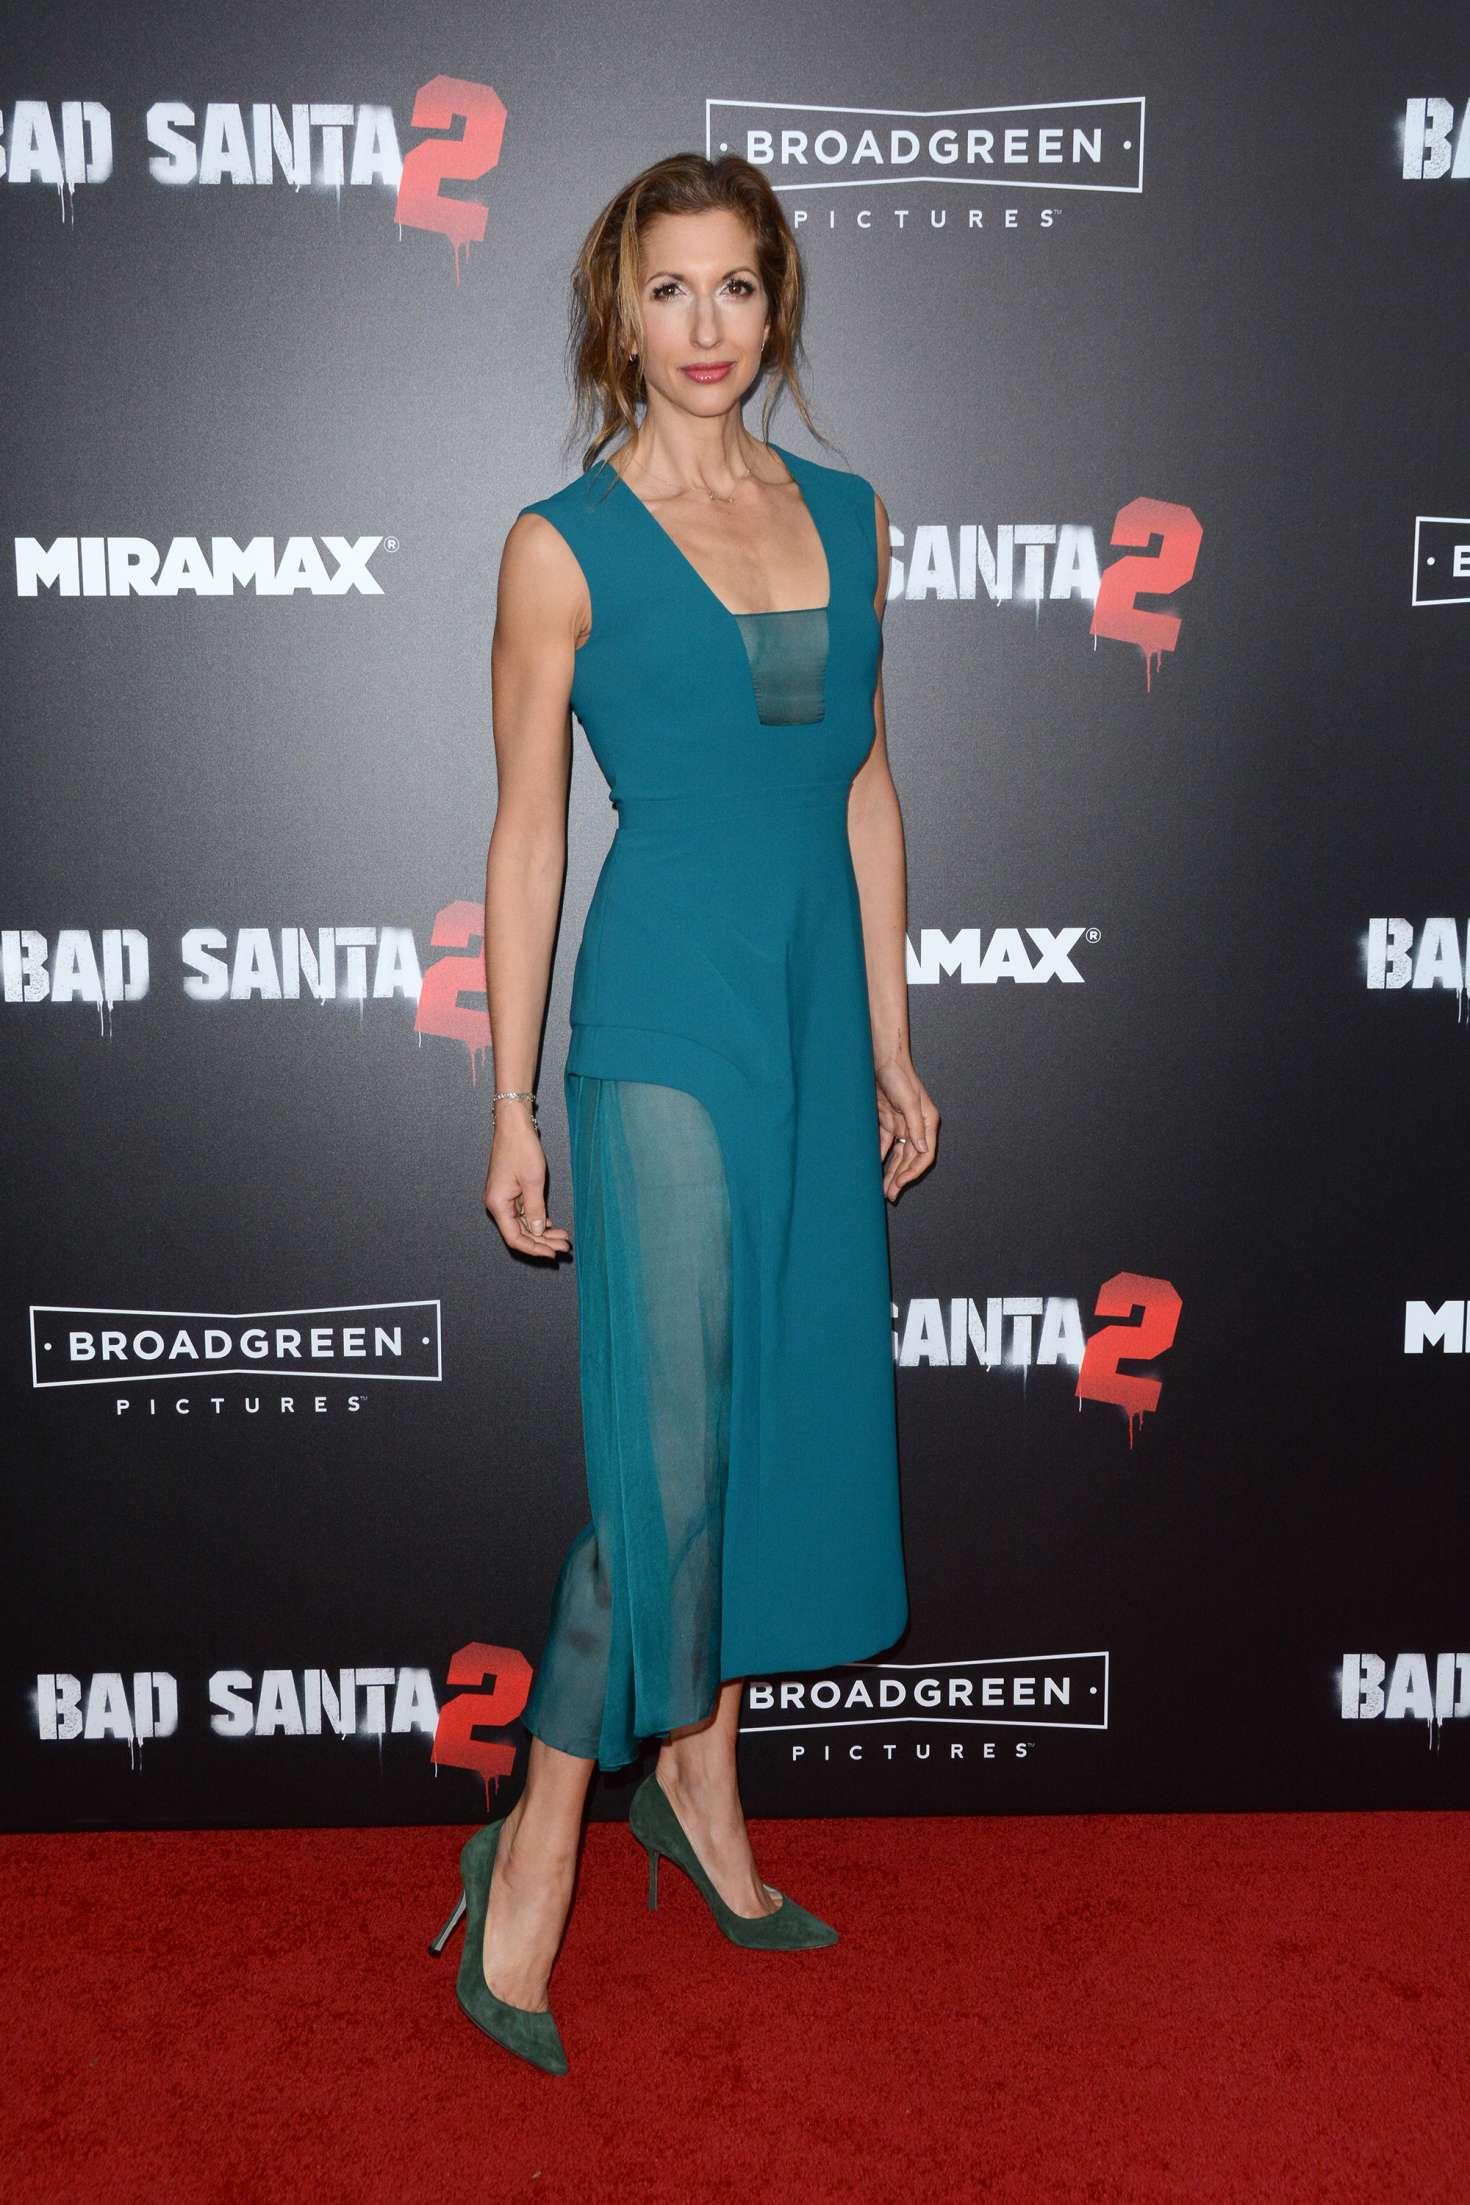 Alysia Reiner - 'Bad Santa 2' Premiere in New York